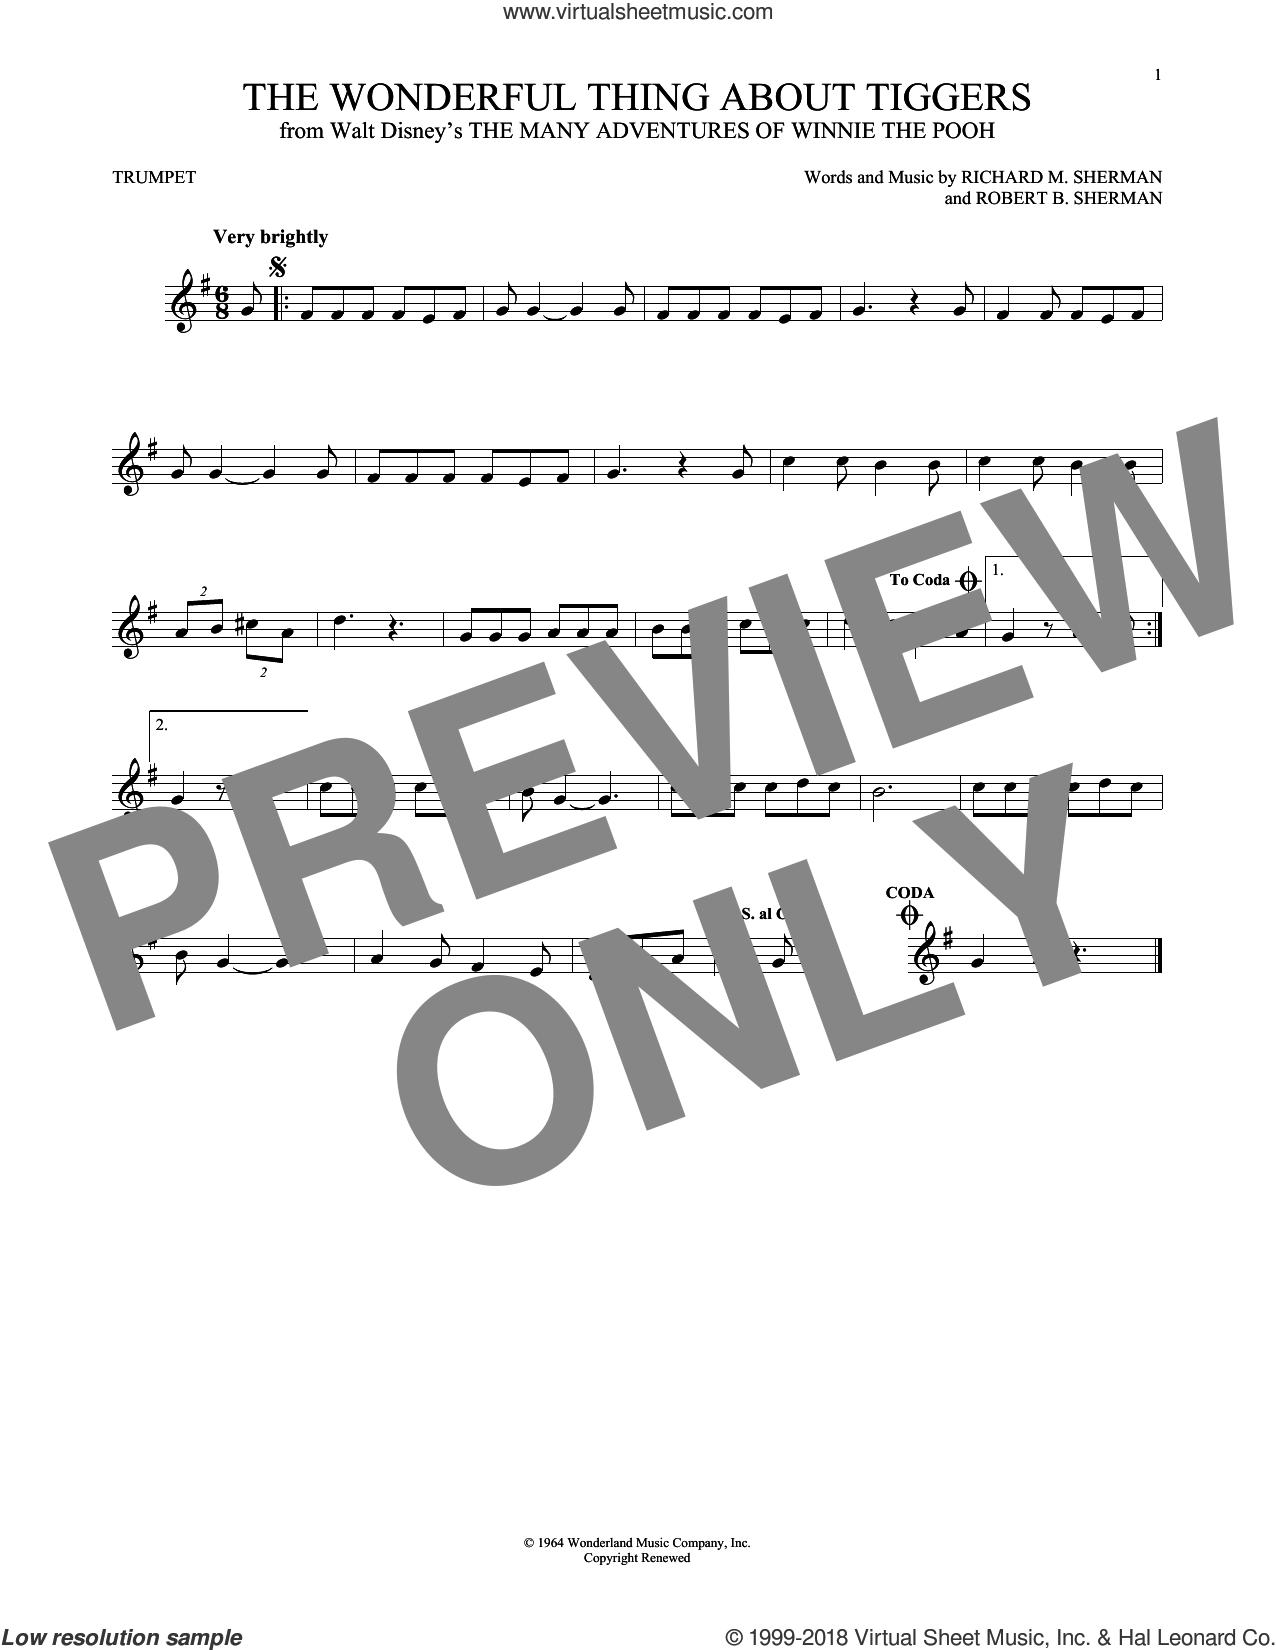 The Wonderful Thing About Tiggers sheet music for trumpet solo by Richard M. Sherman, Richard & Robert Sherman and Robert B. Sherman, intermediate skill level